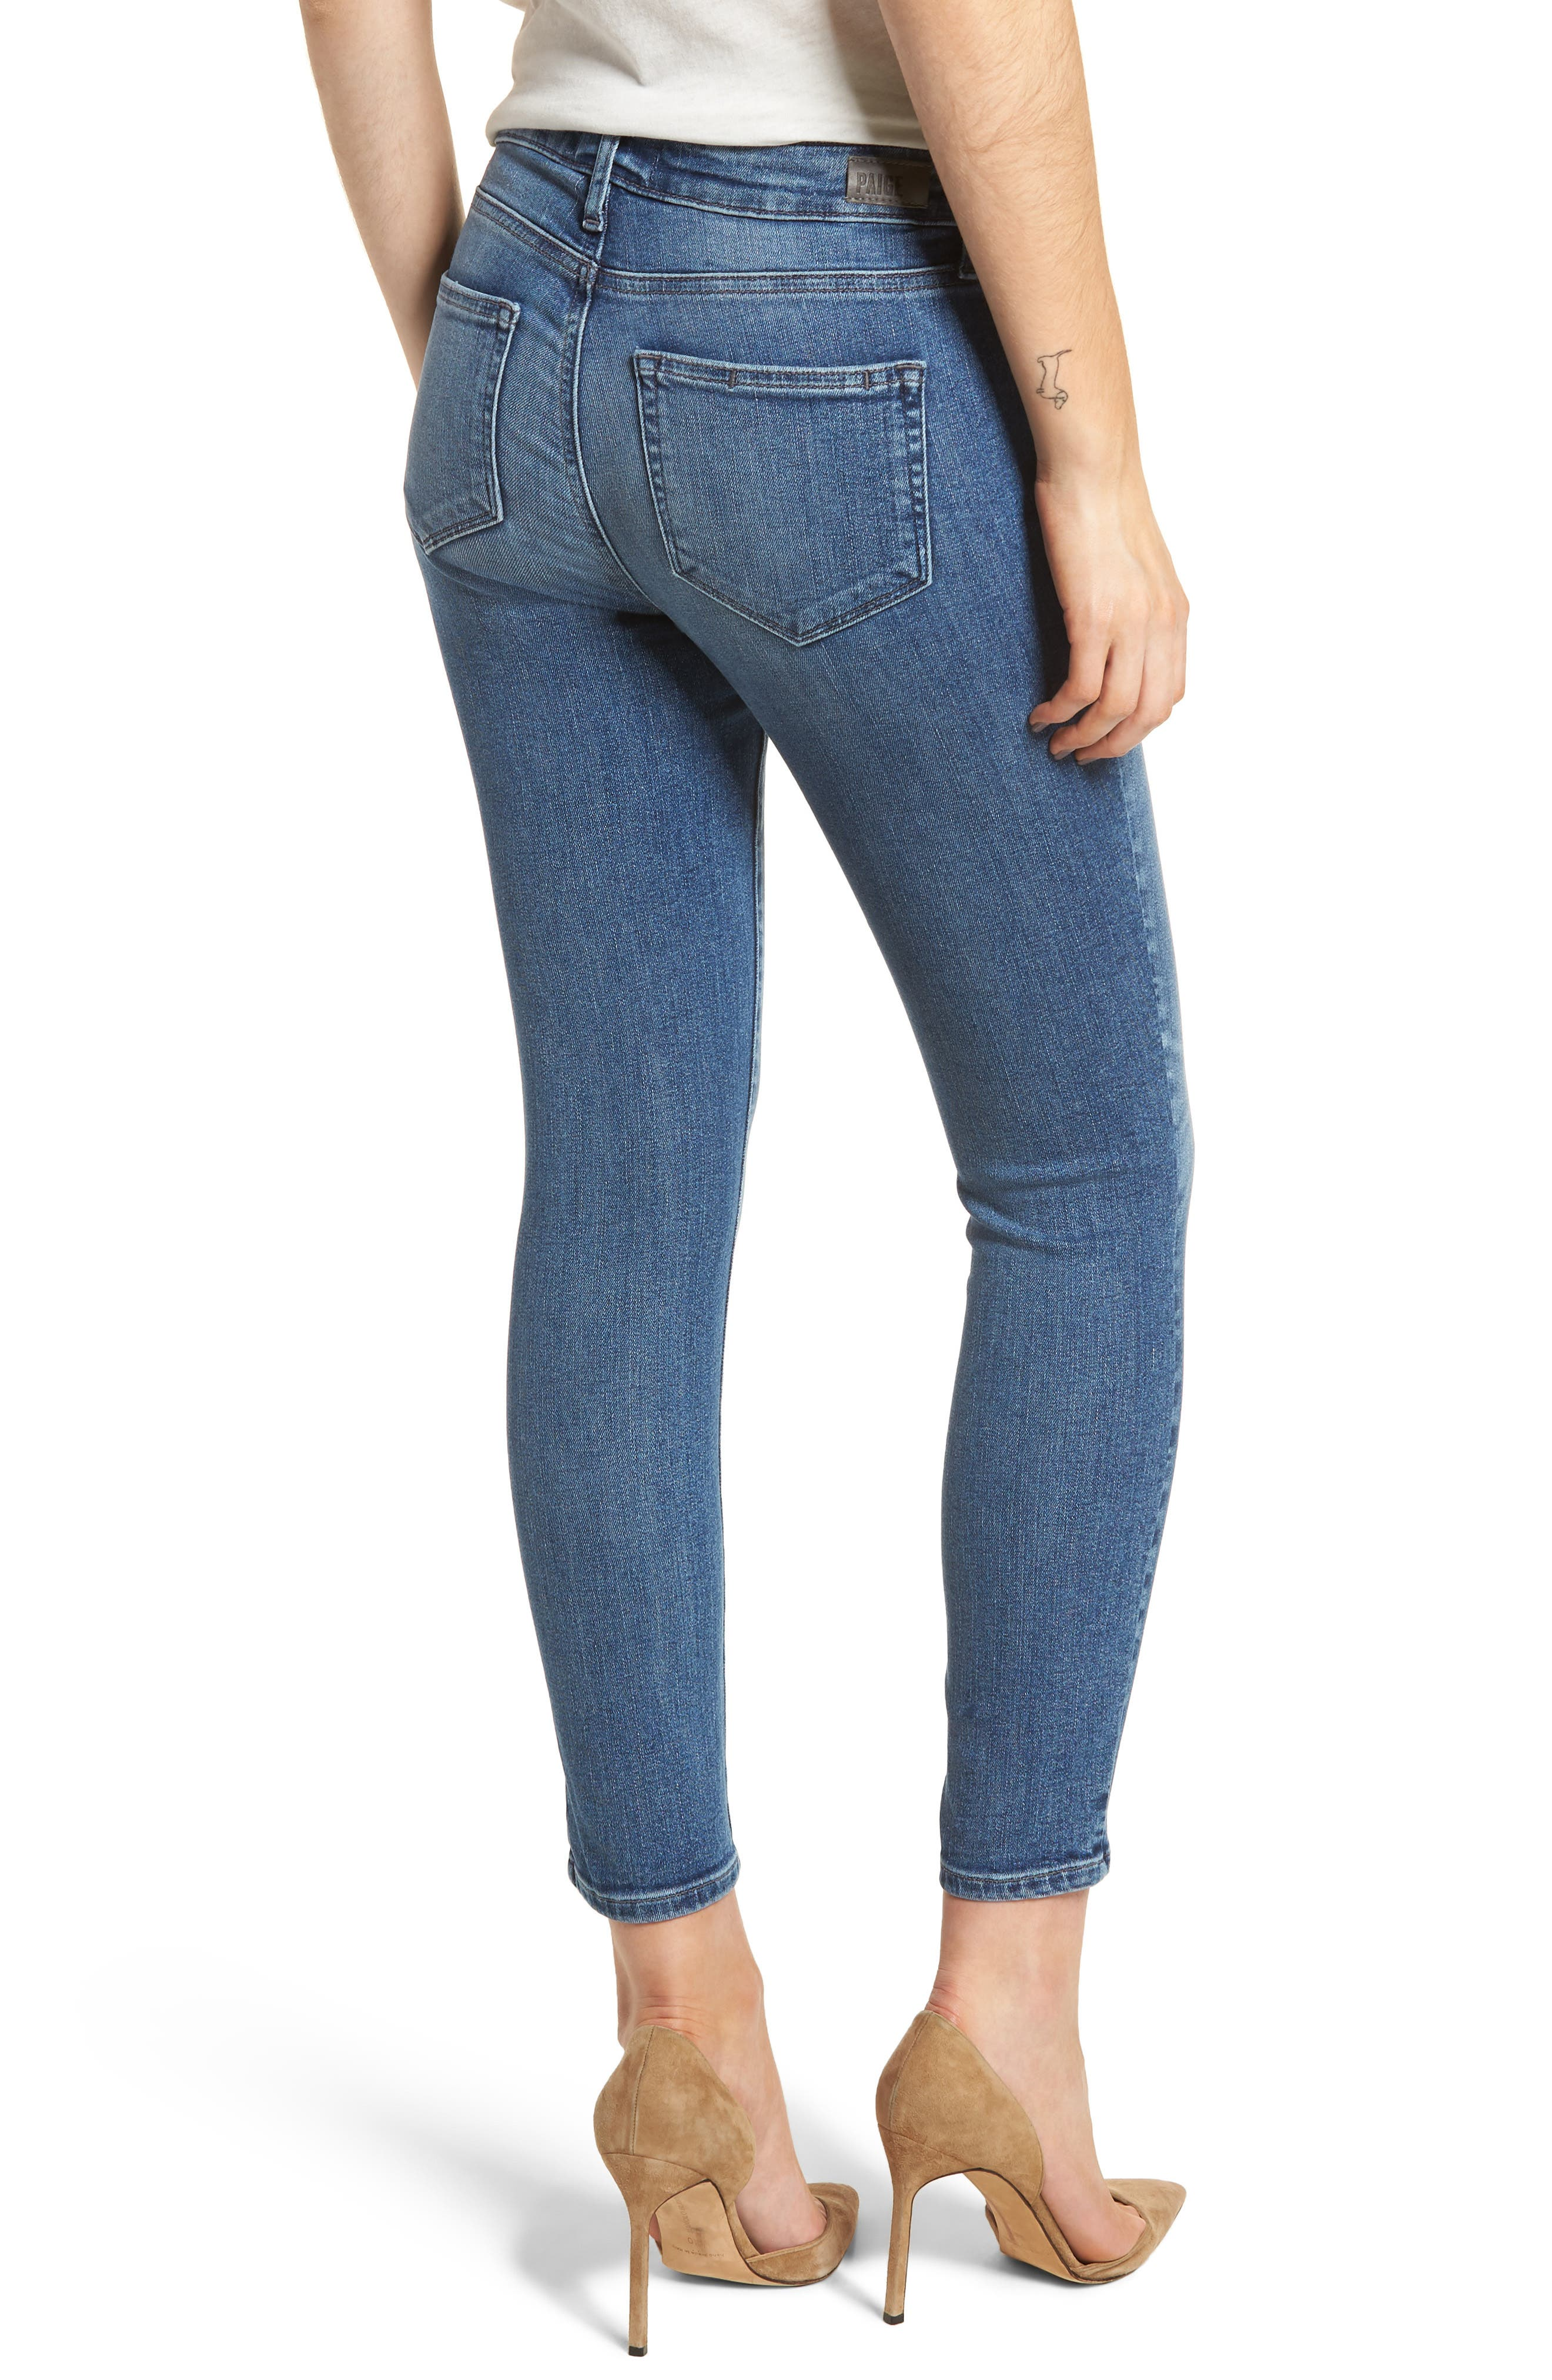 Transcend Vintage - Verdugo Crop Ultra Skinny Jeans,                             Alternate thumbnail 2, color,                             Bloomfield